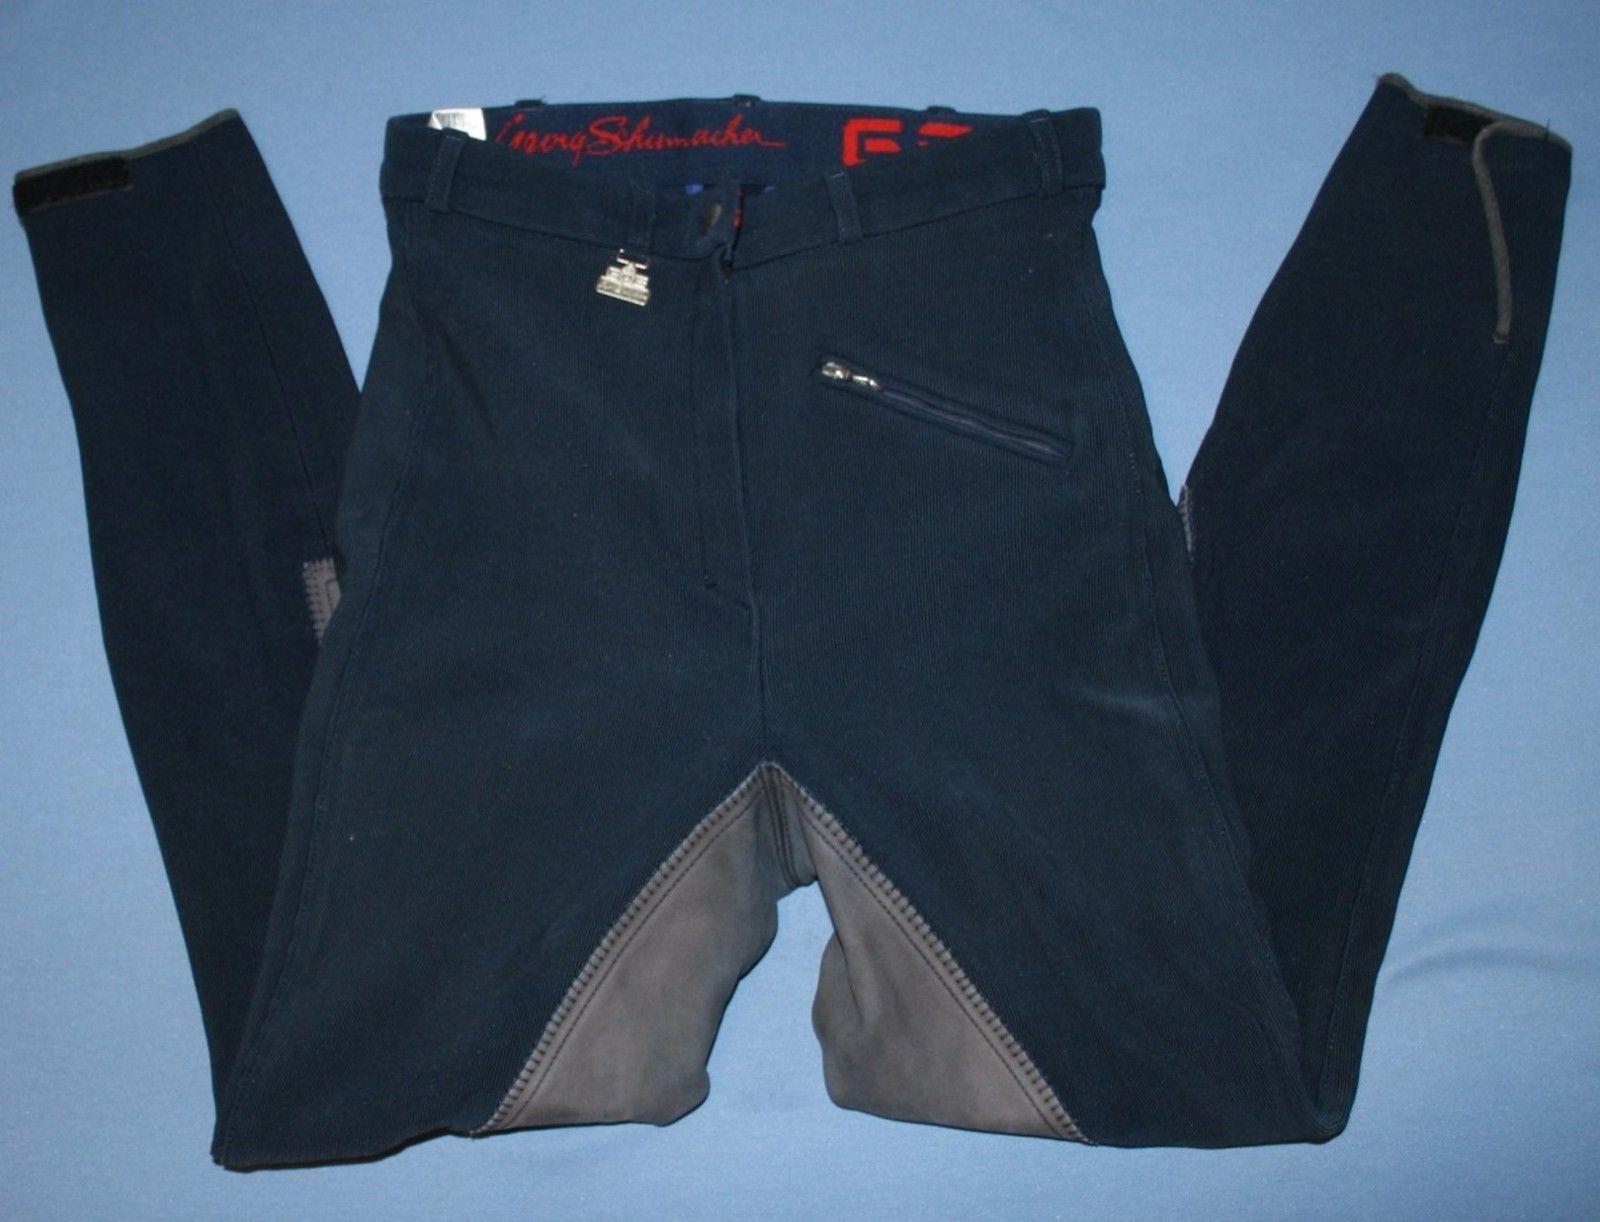 73ead945da2c Navy Blue Gerry Schumaker Sz 26L 26 L Riding Pants Womens Equestrian Jockey  -  27.71